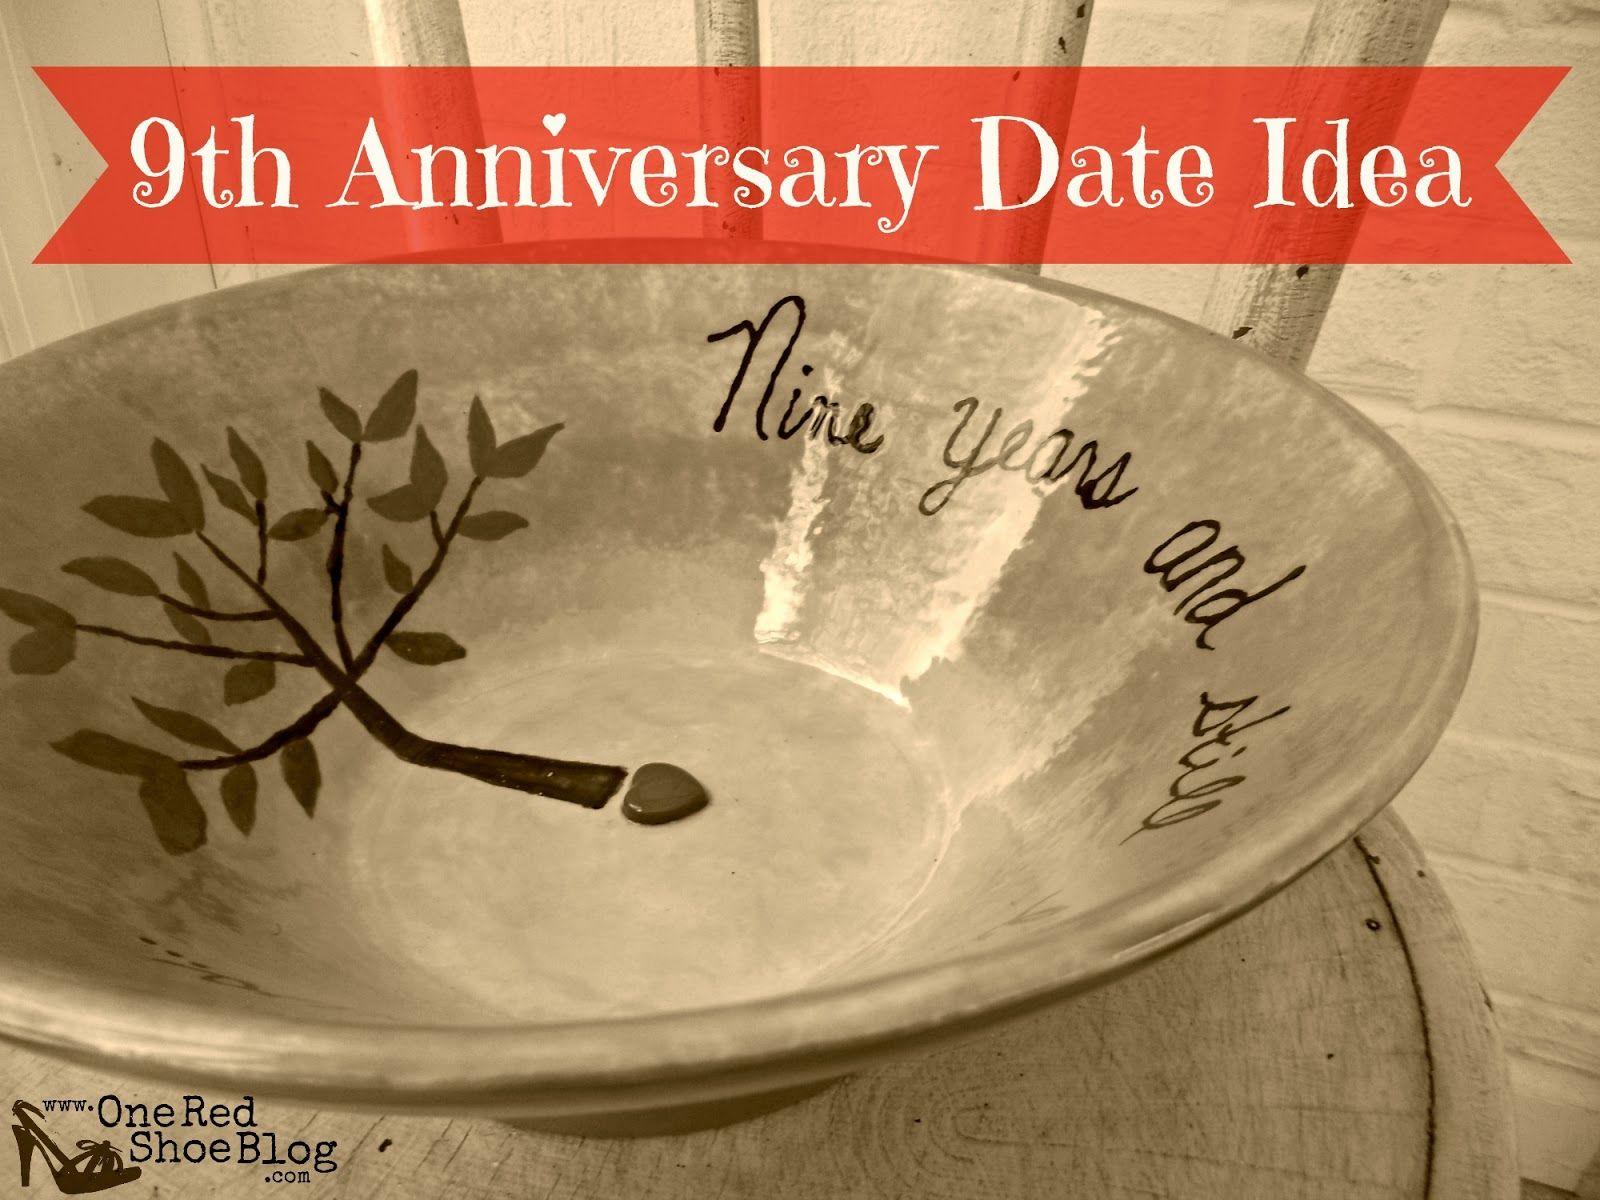 9th anniversary pottery idea for anniversary date night